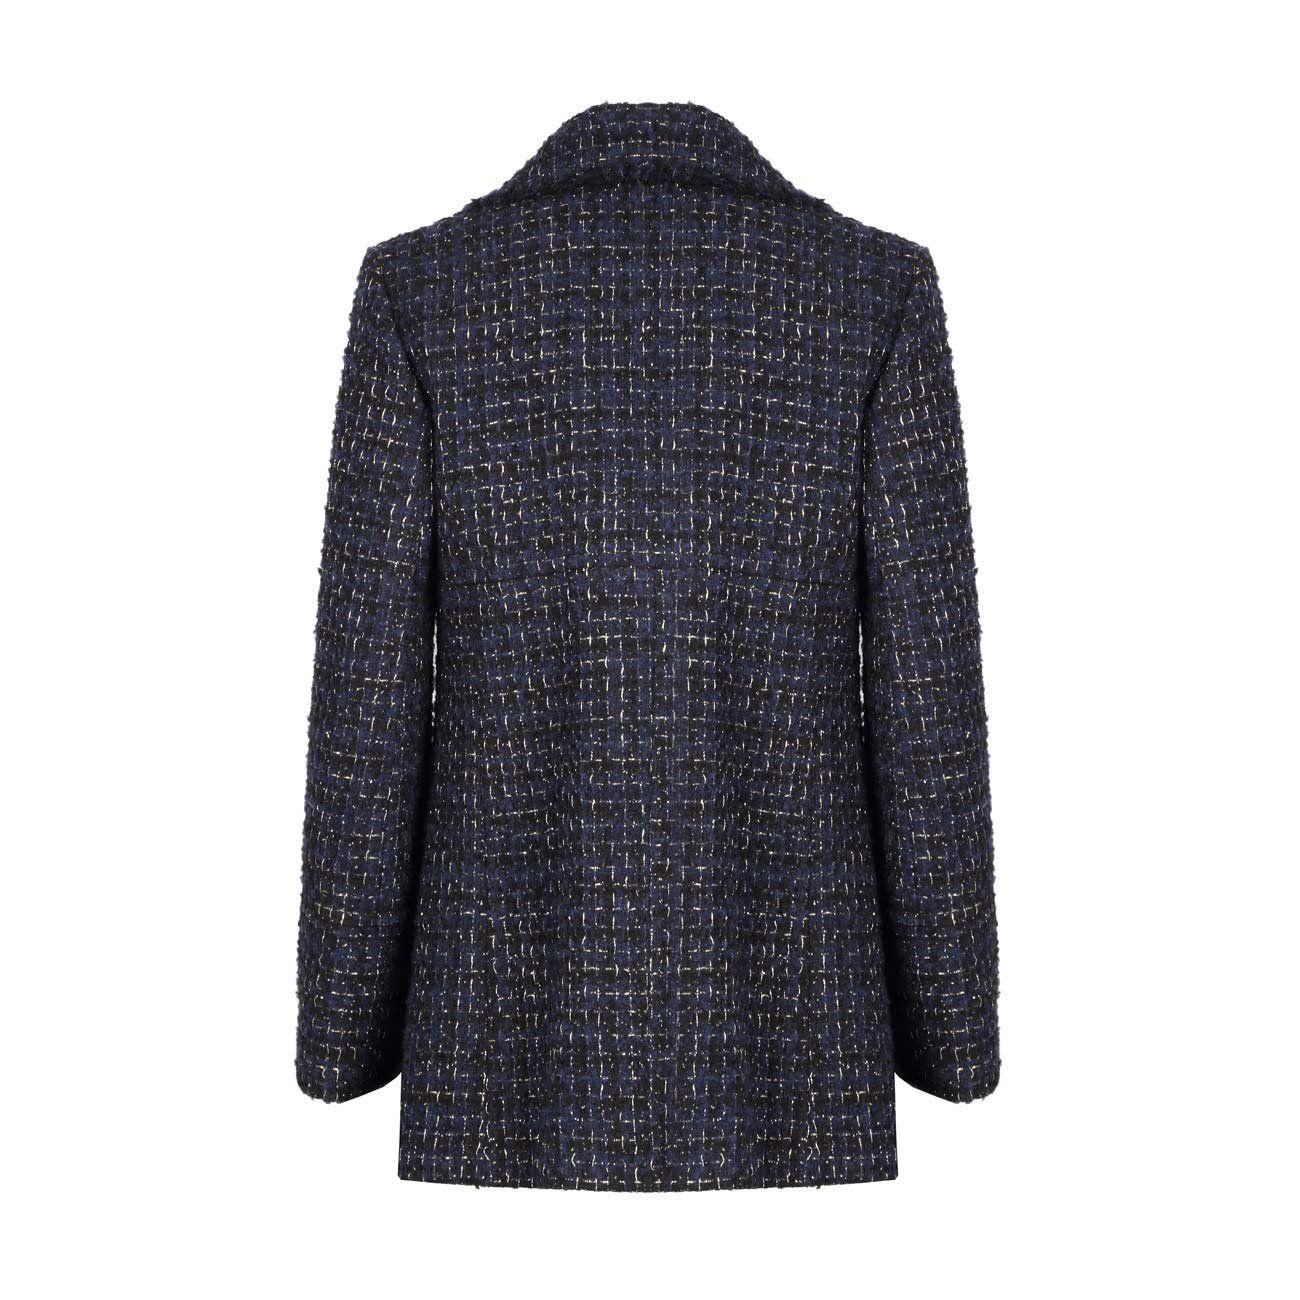 Laminated tweed jacket